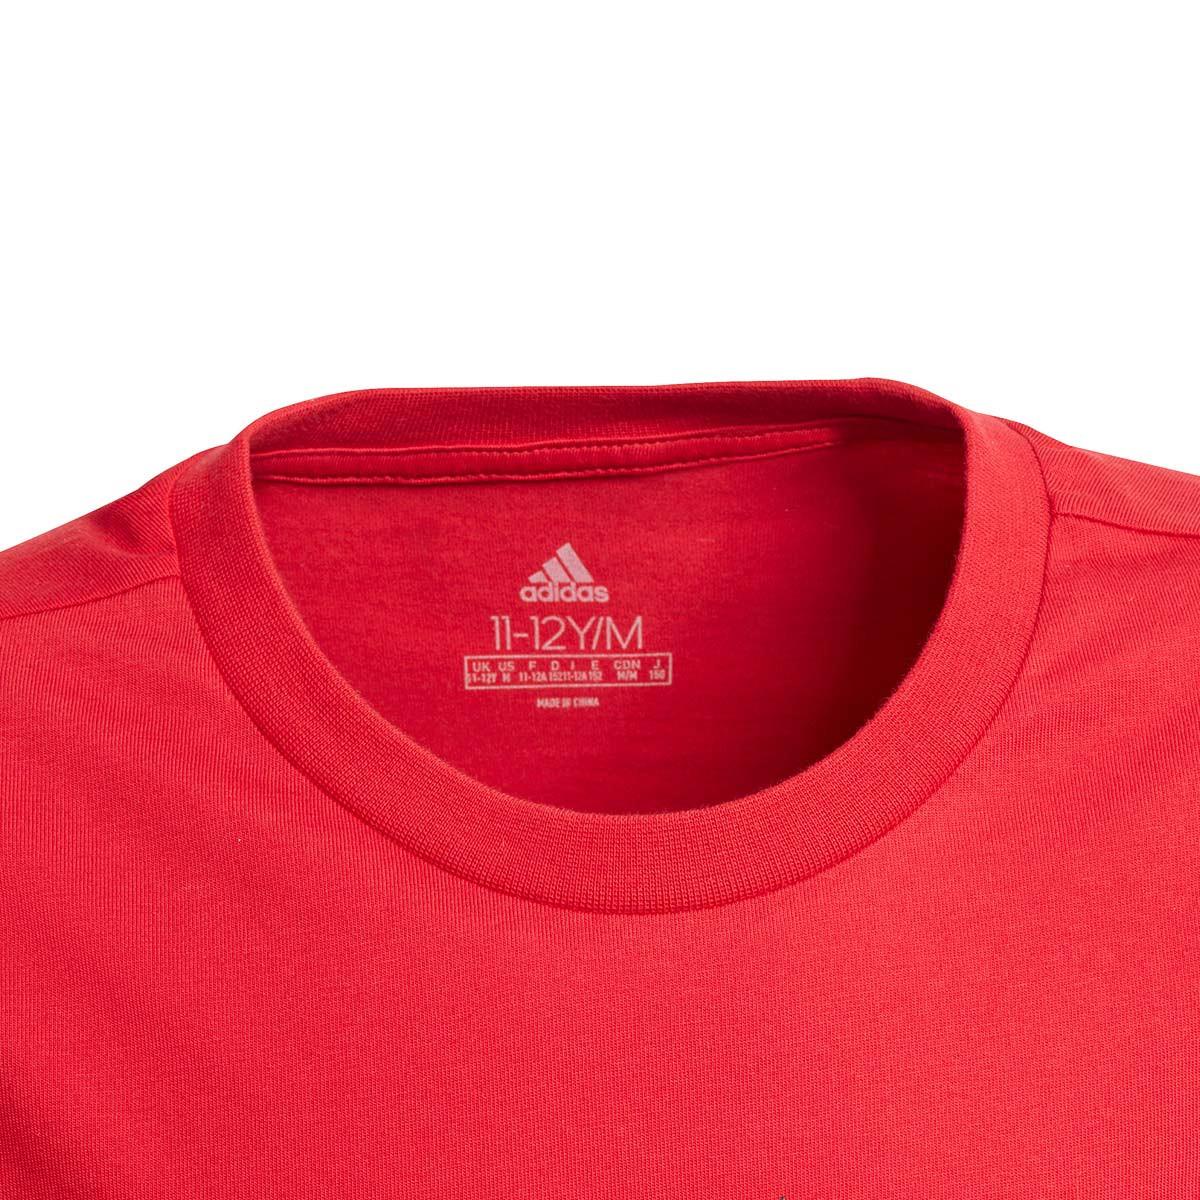 Jersey Adidas Manchester United Fc Gr Tee 2020 2021 Nino Real Red Football Store Futbol Emotion